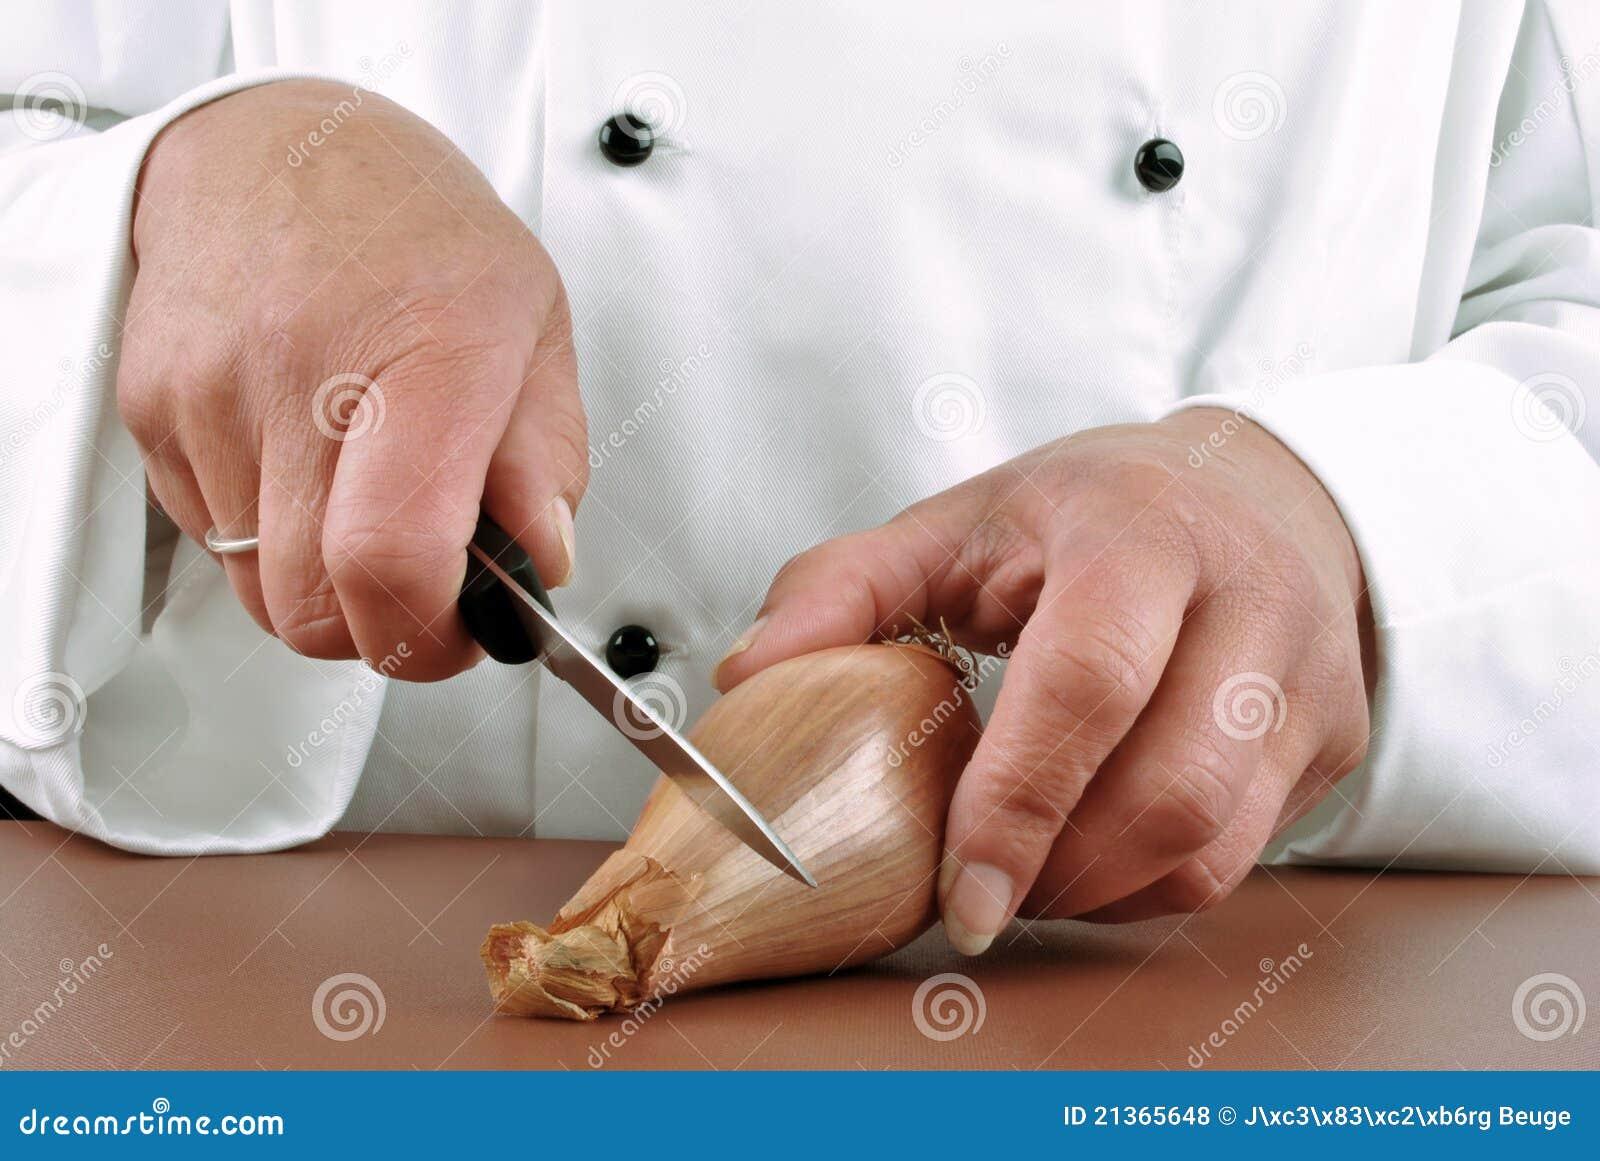 how to cut onion gordon